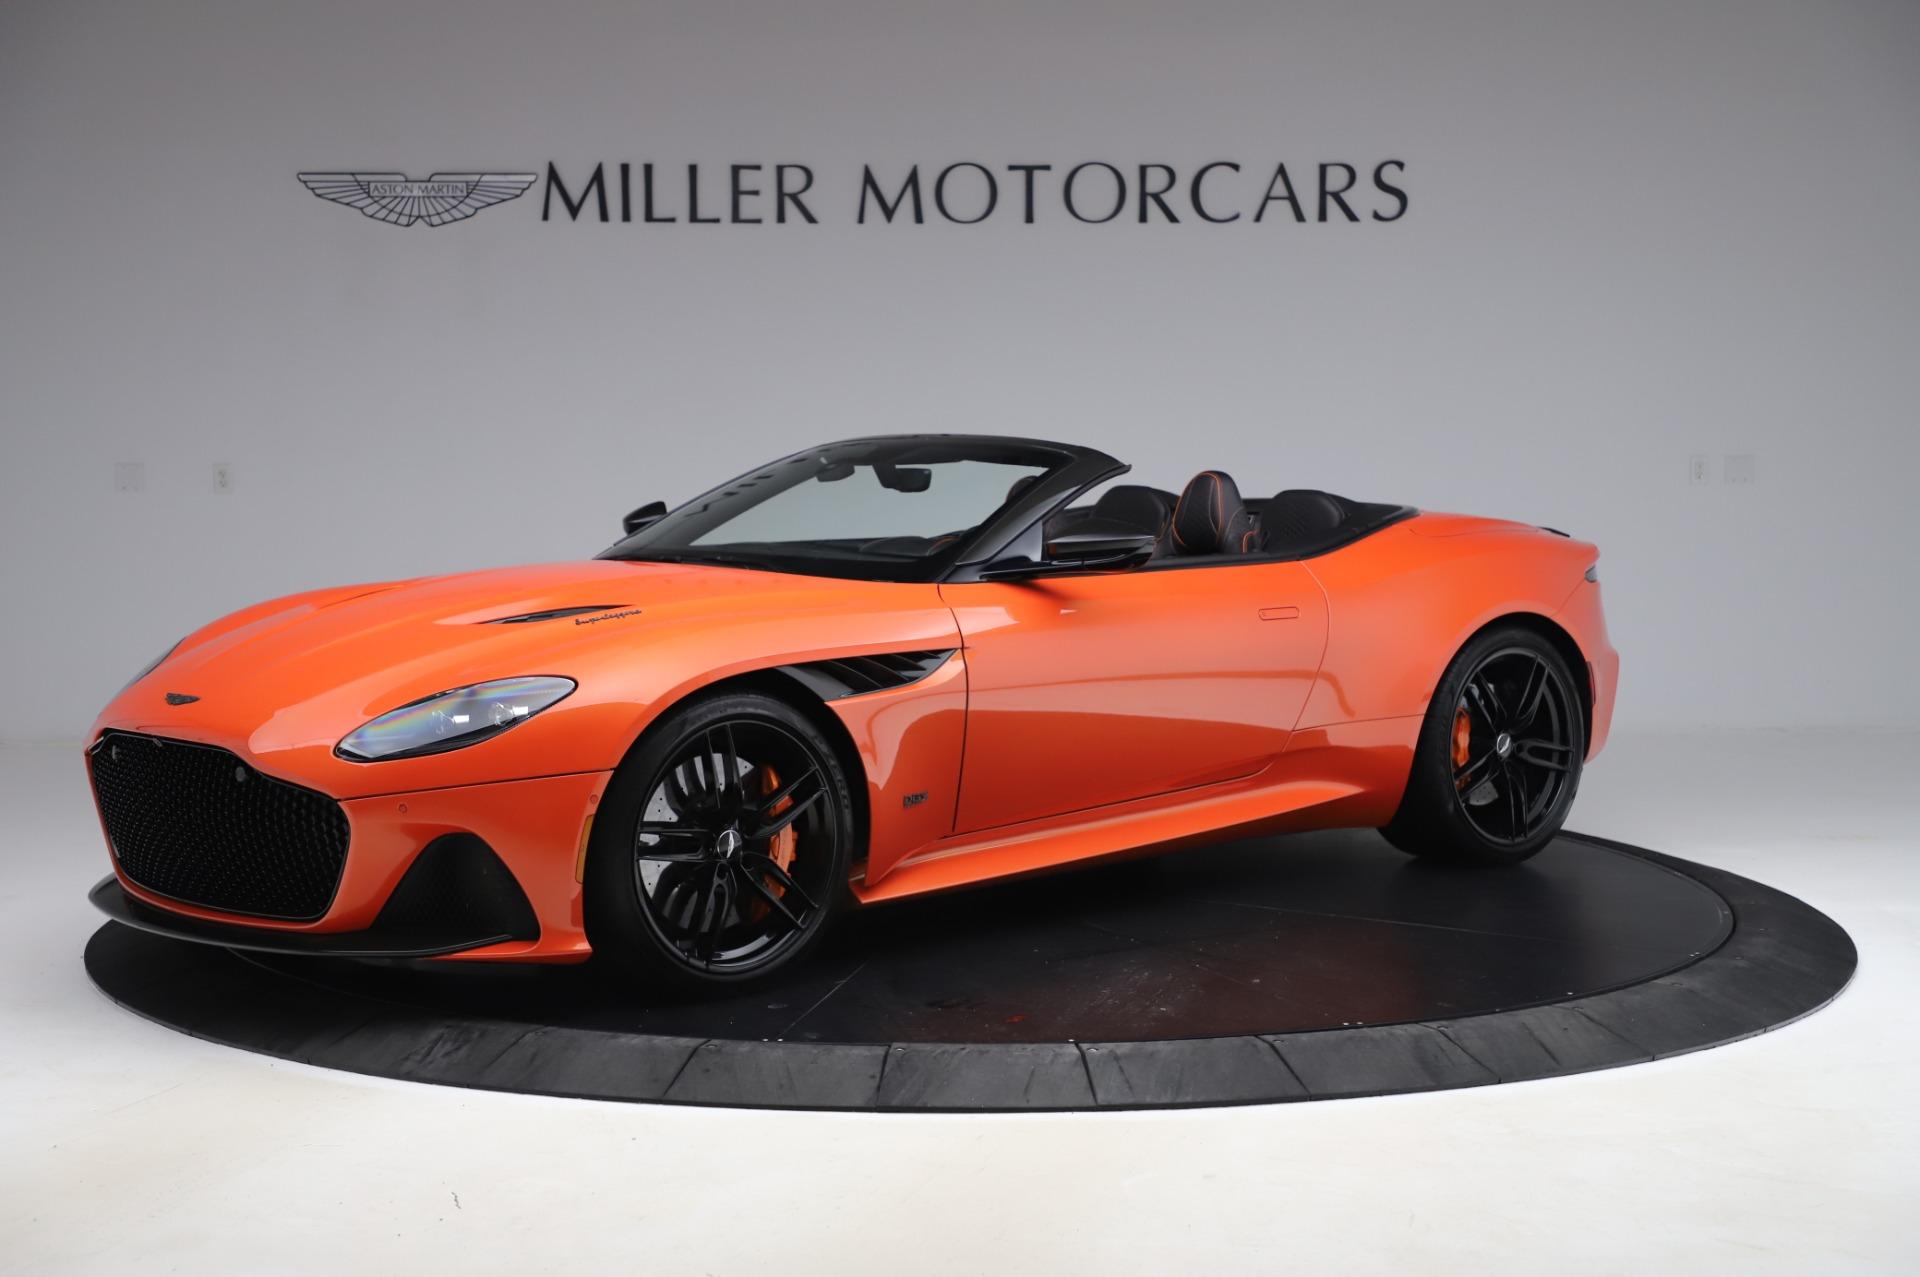 Used 2020 Aston Martin DBS Superleggera for sale $339,900 at Alfa Romeo of Greenwich in Greenwich CT 06830 1